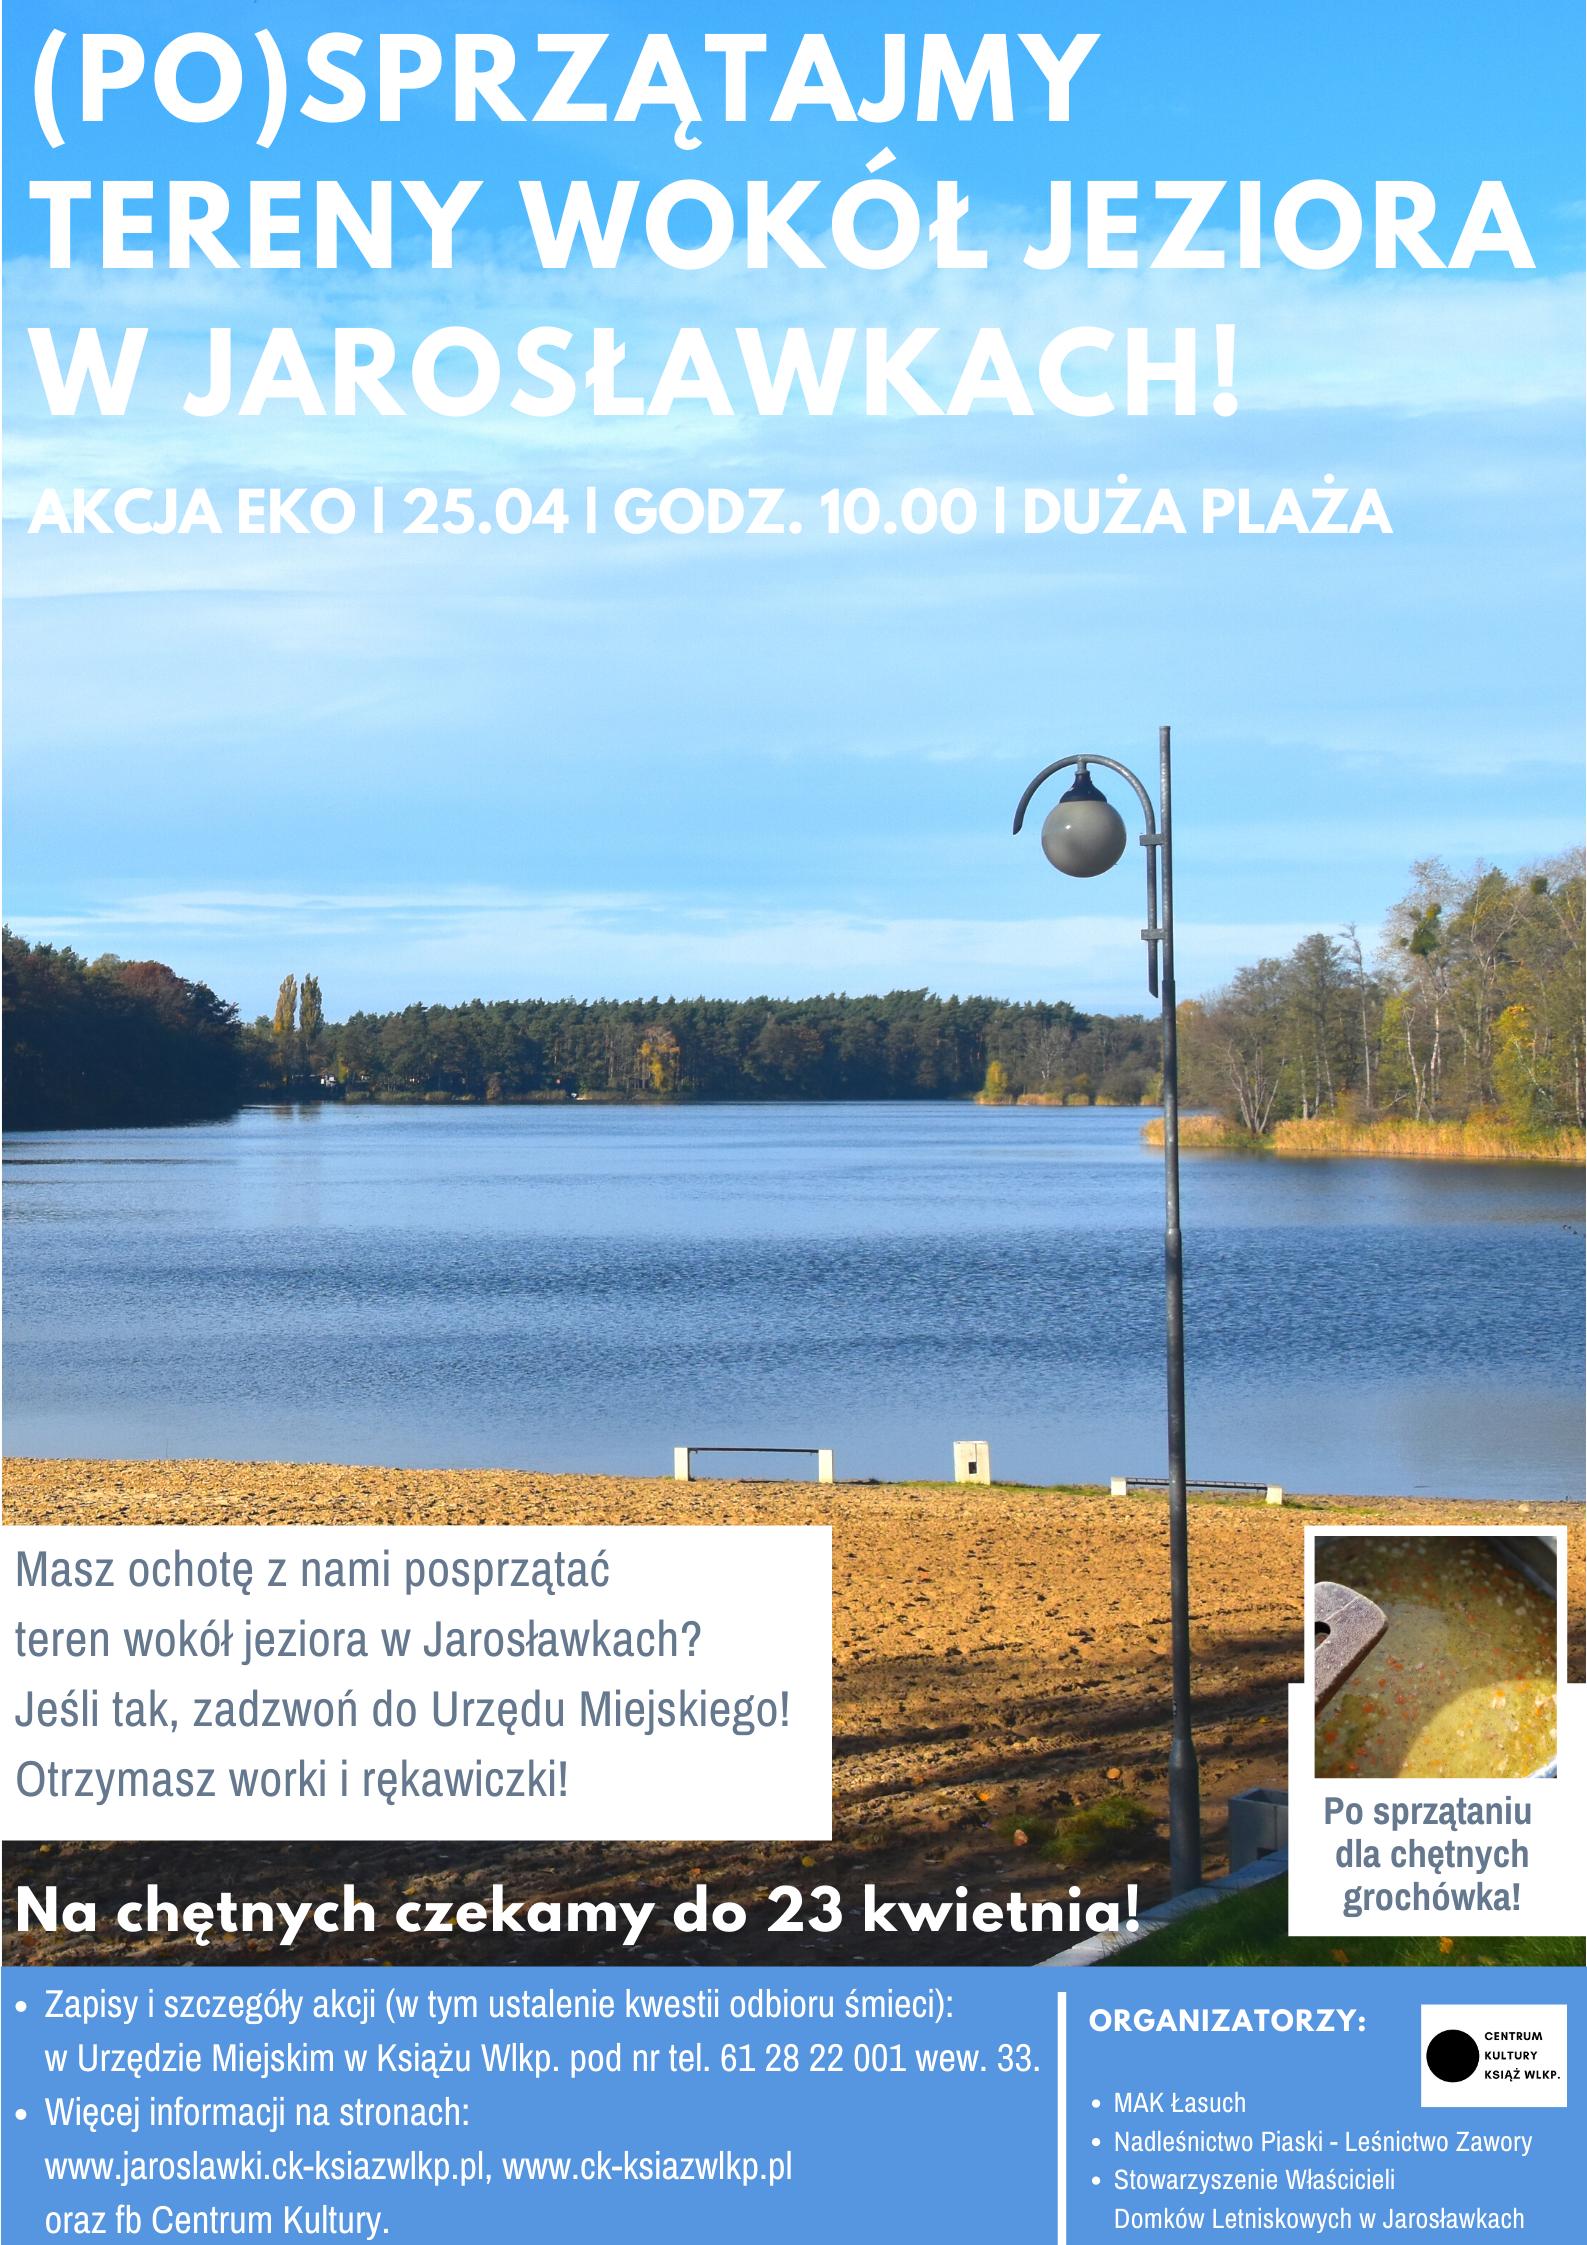 Na obrazku jest jezioro, las, lampa i tekst